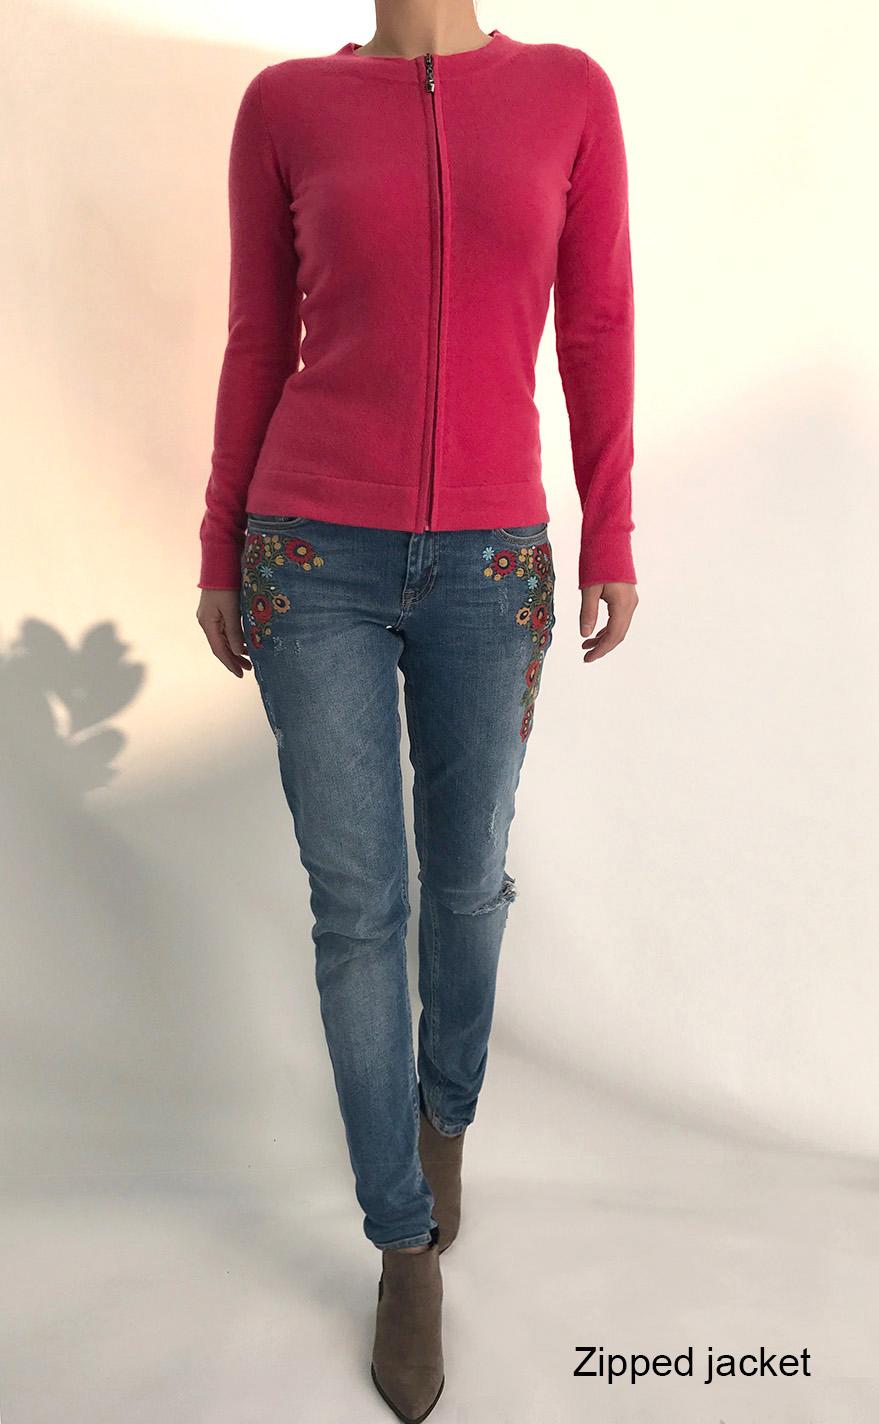 SEMON Cashmere zipped jacket in rose pink.jpg